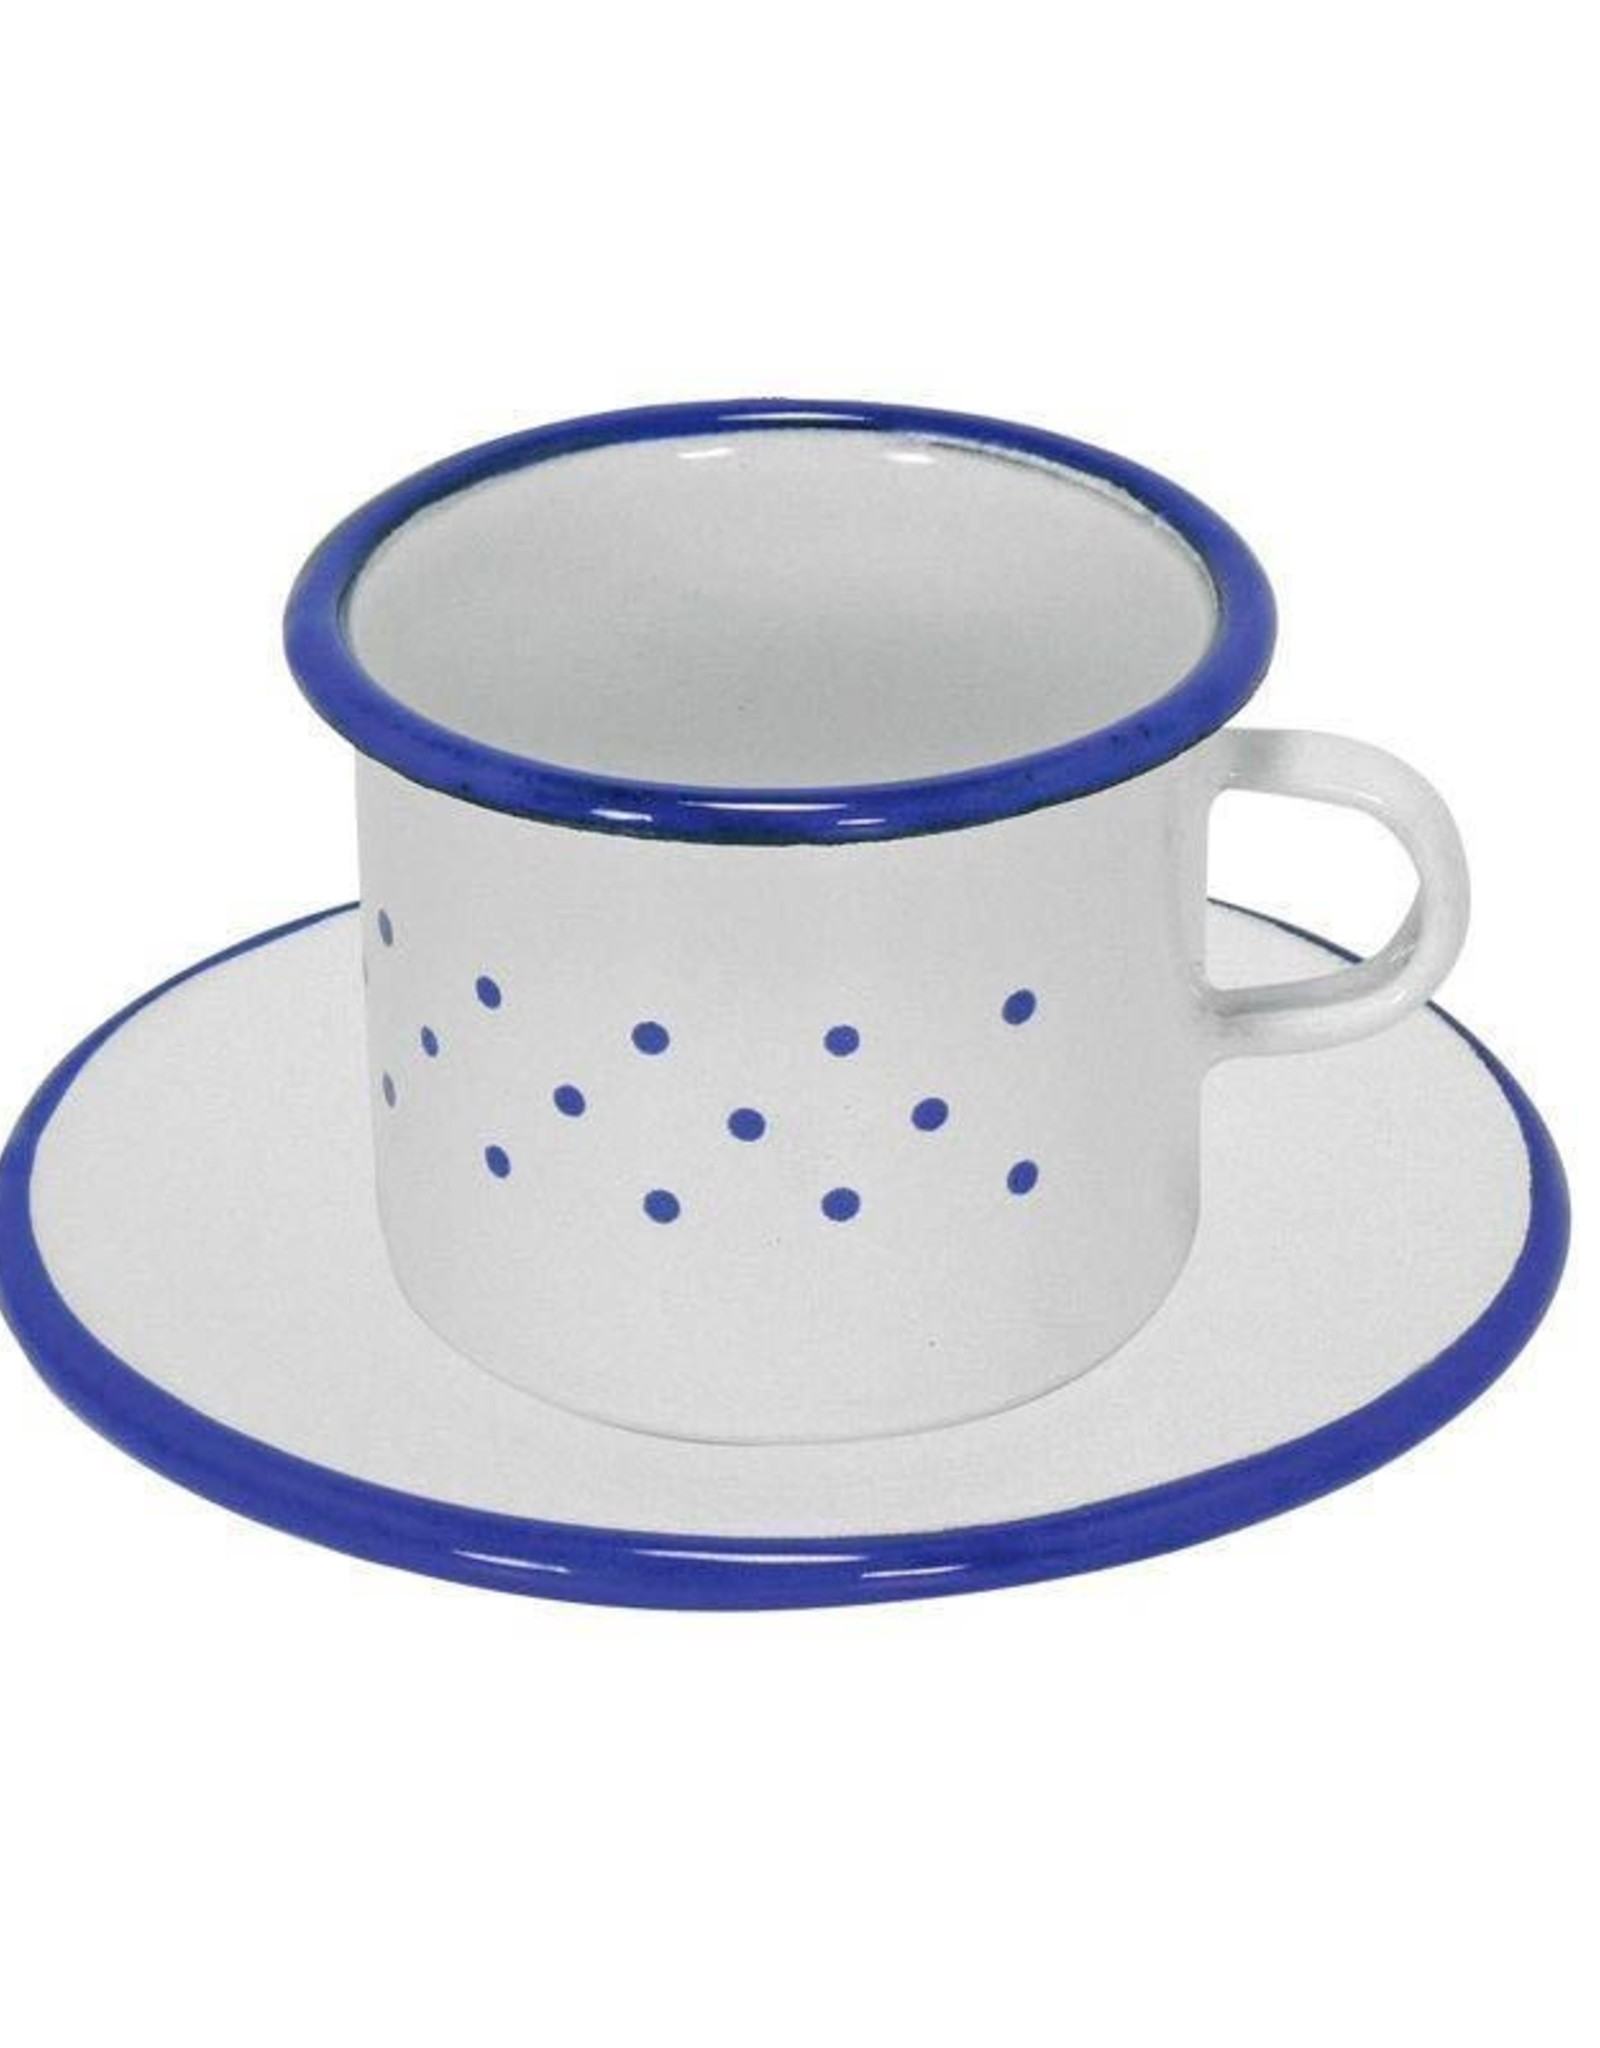 Gluckskafer Cup and saucer